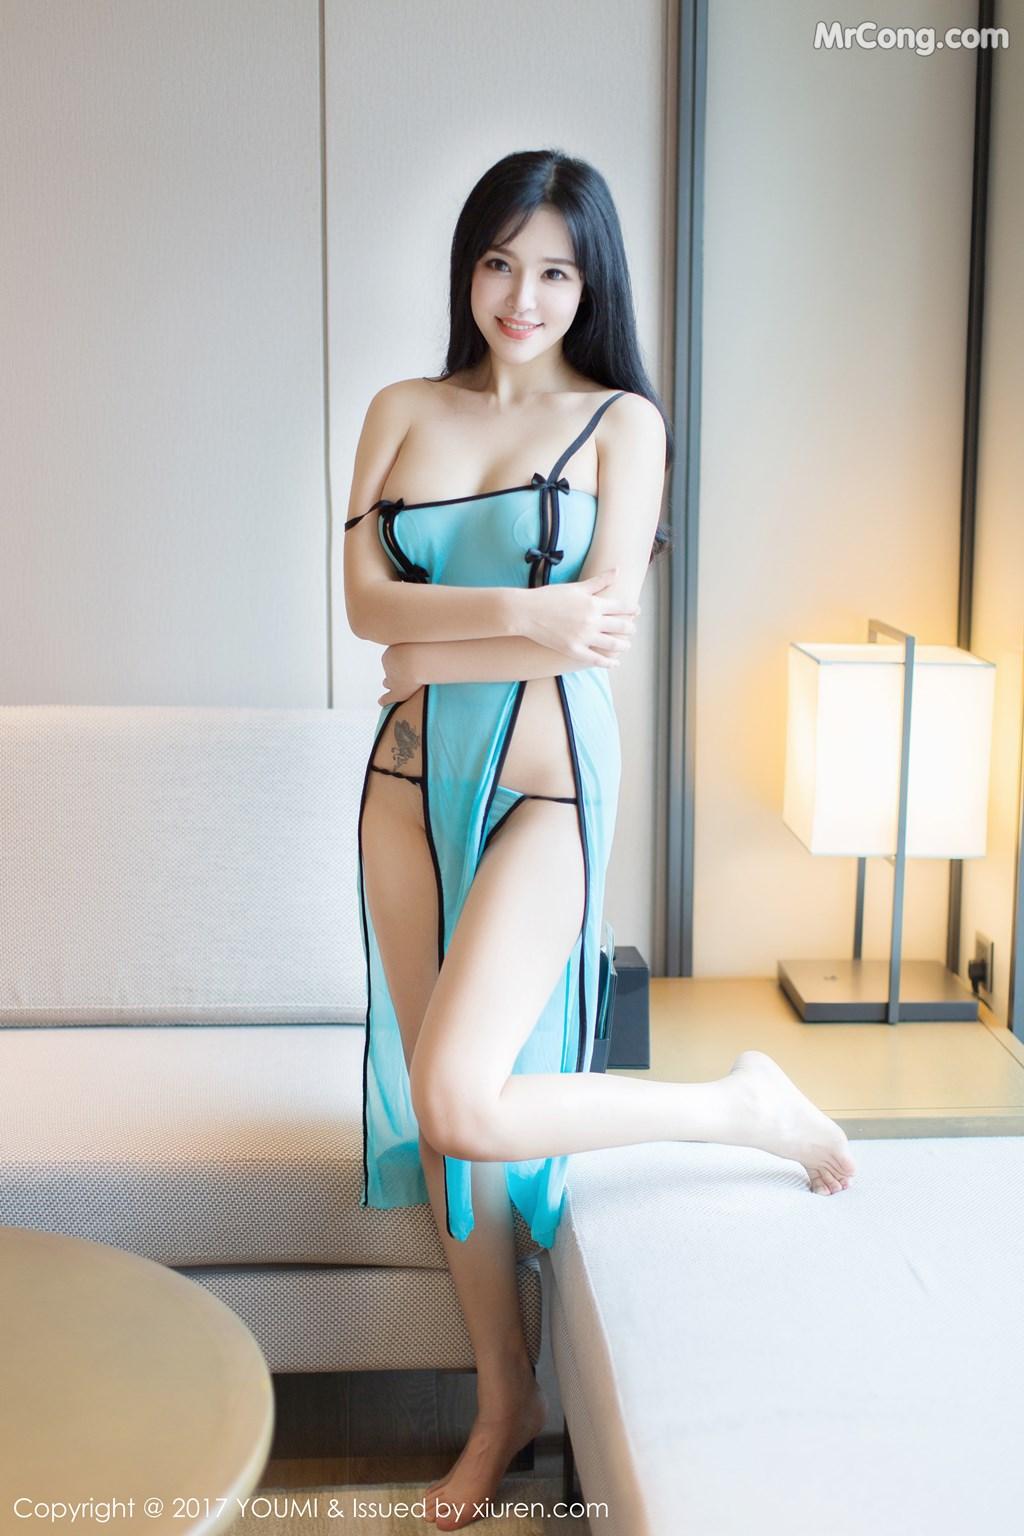 Image YouMi-No.067-Liu-Yu-Er-MrCong.com-033 in post YouMi No.067: Người mẫu Liu Yu Er (刘钰儿) (45 ảnh)